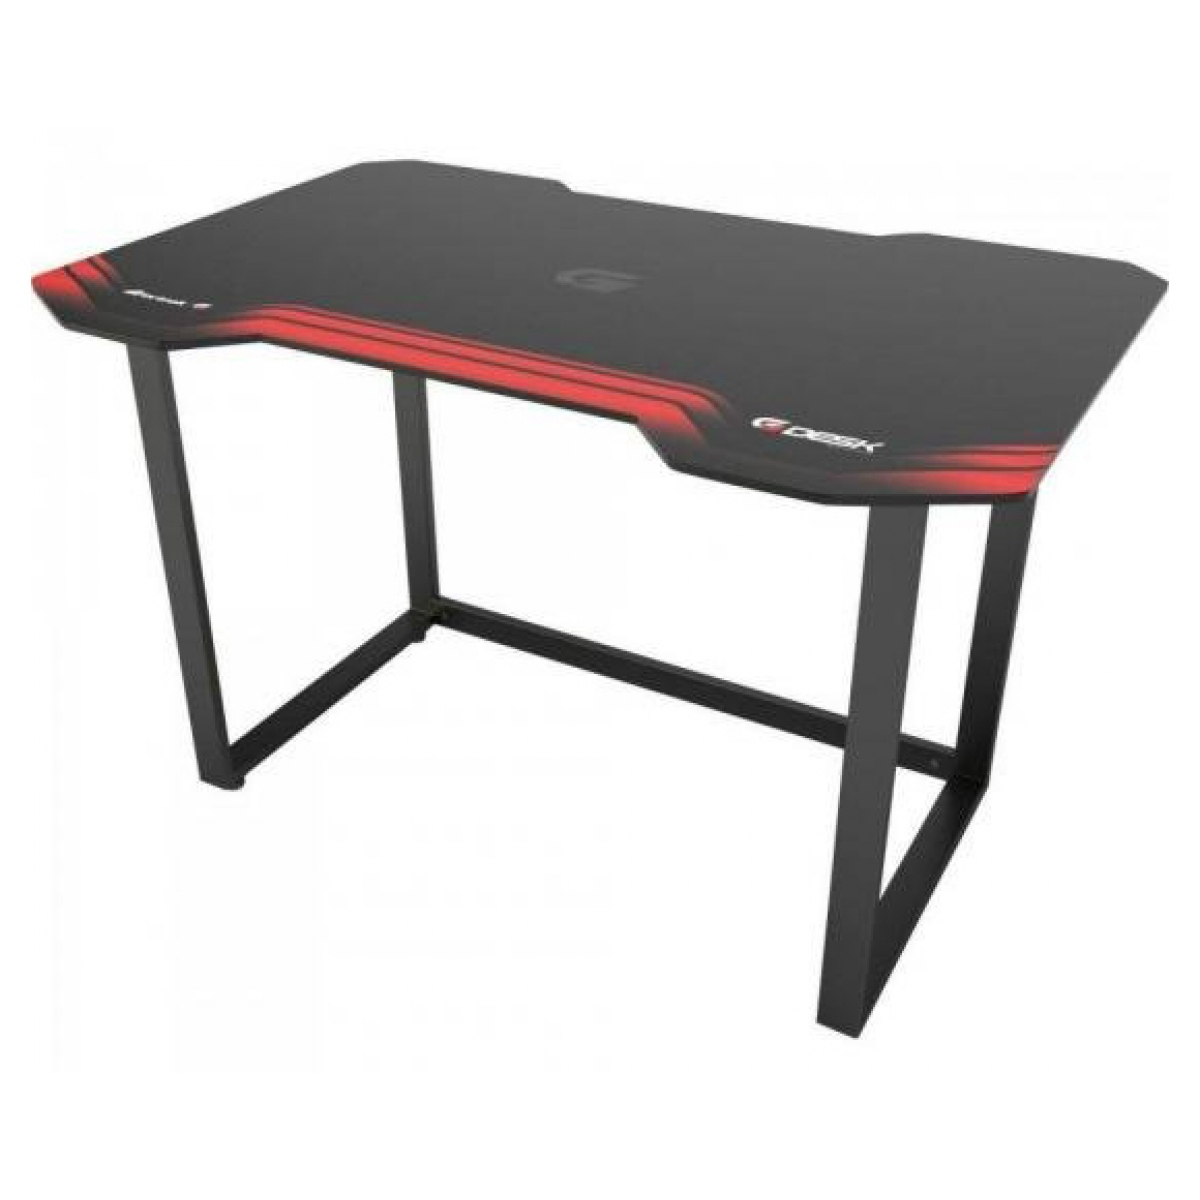 Mesa Gamer Fortrek HMG01, 120cm, Red, 66431